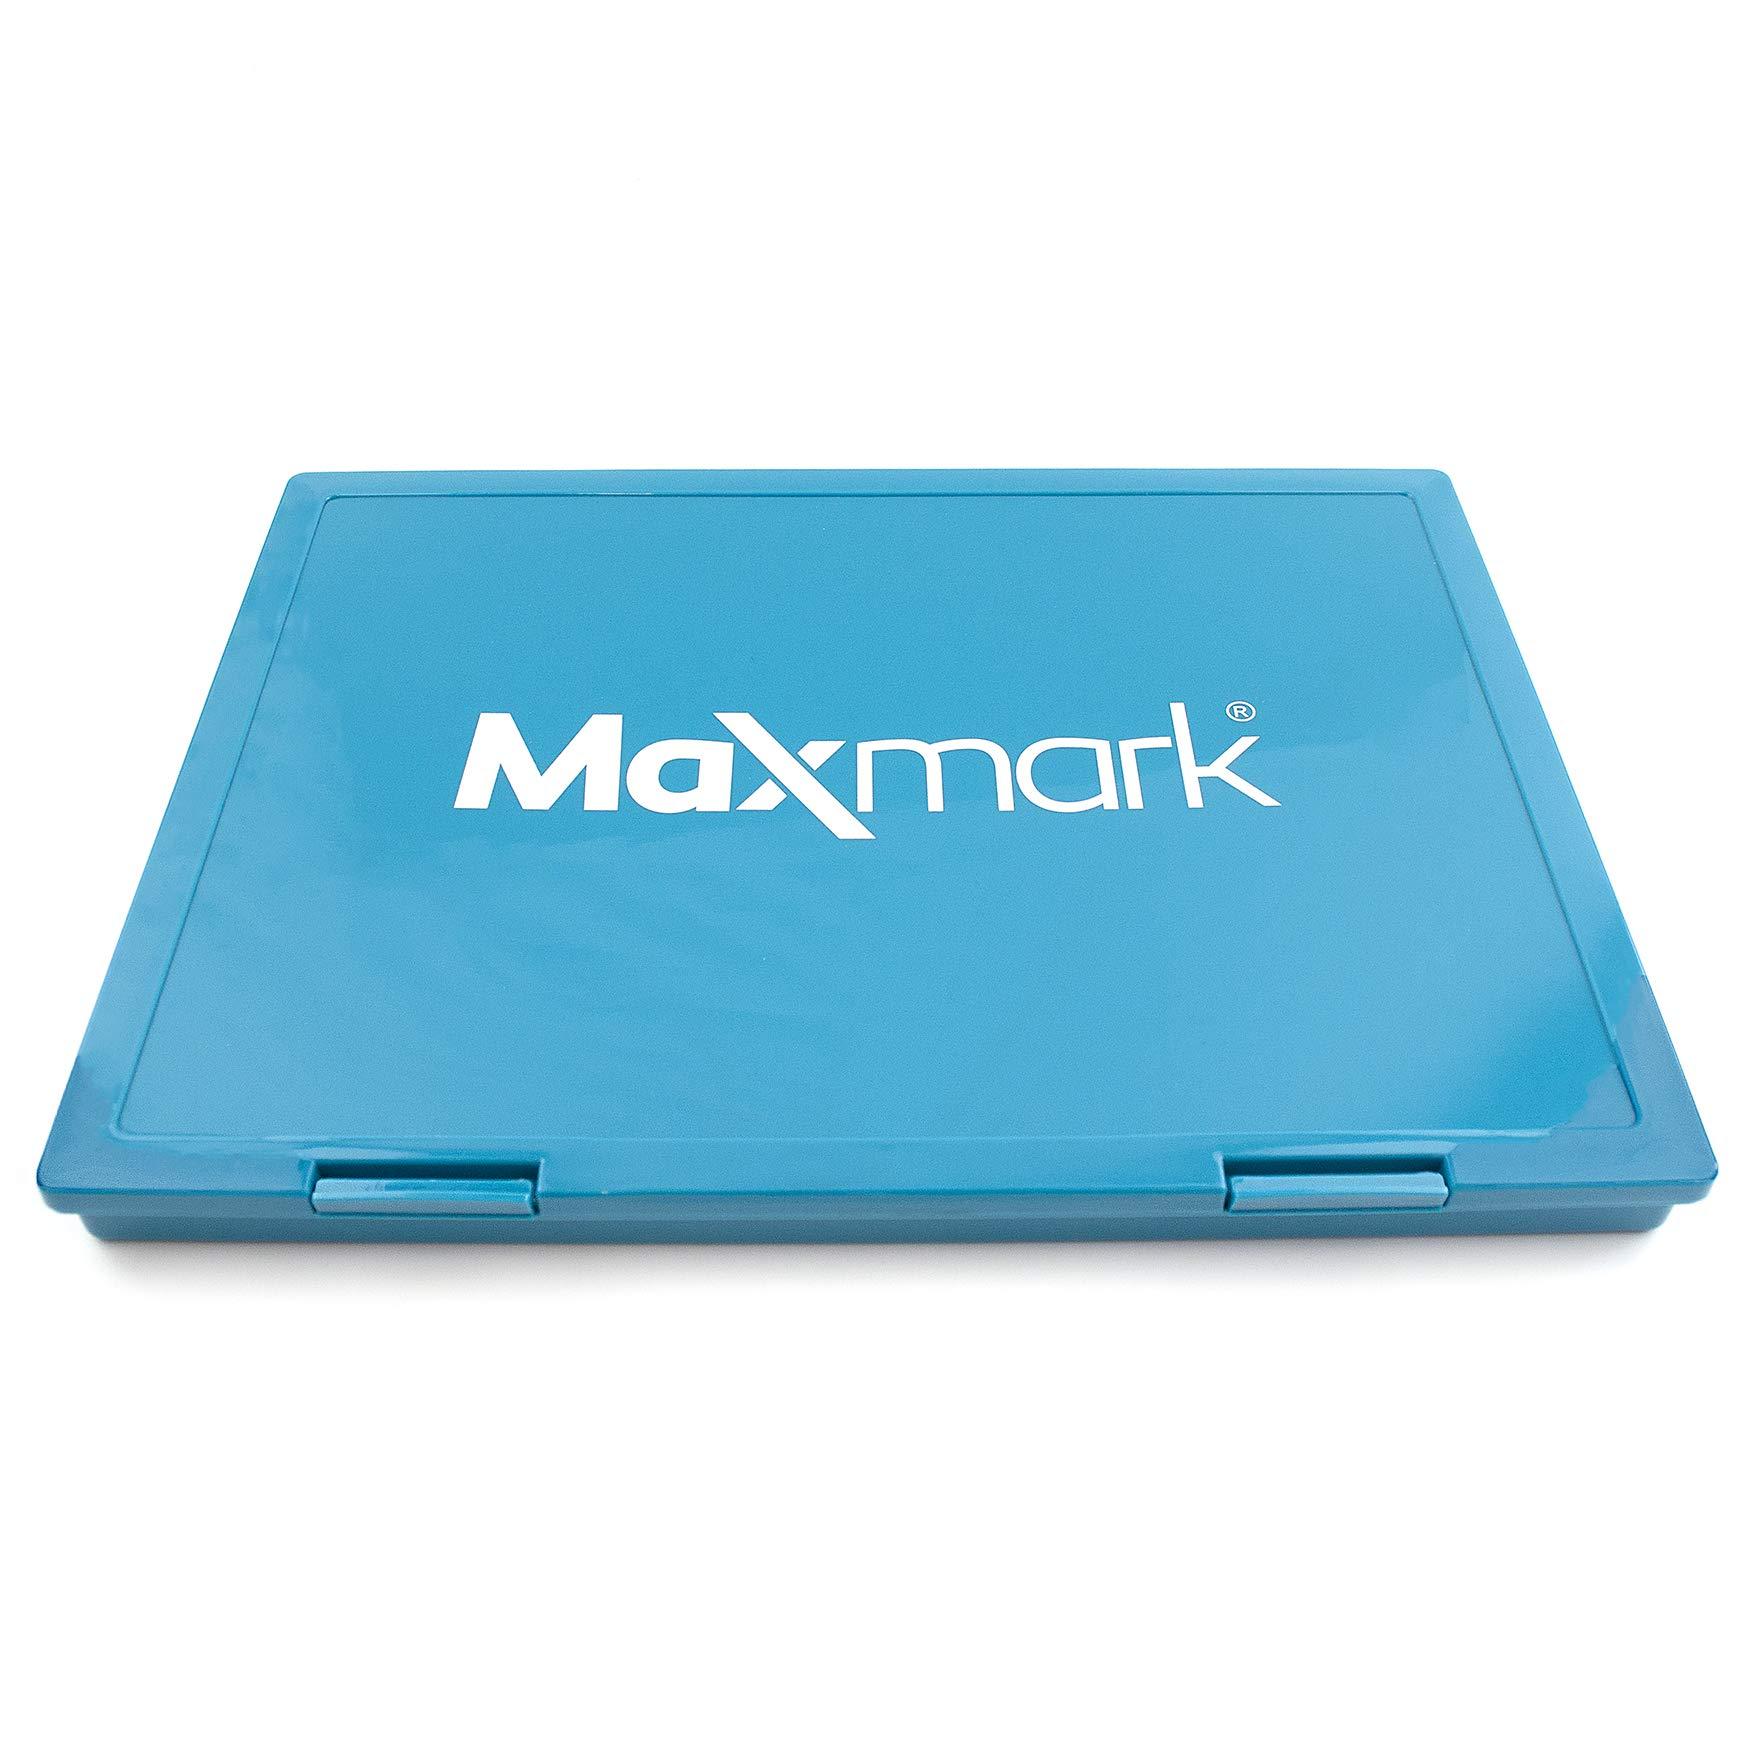 MaxMark Extra Large Black Ink Stamp Pad - 8.25'' x 11.5'' - Industrial Felt Pad by MaxMark